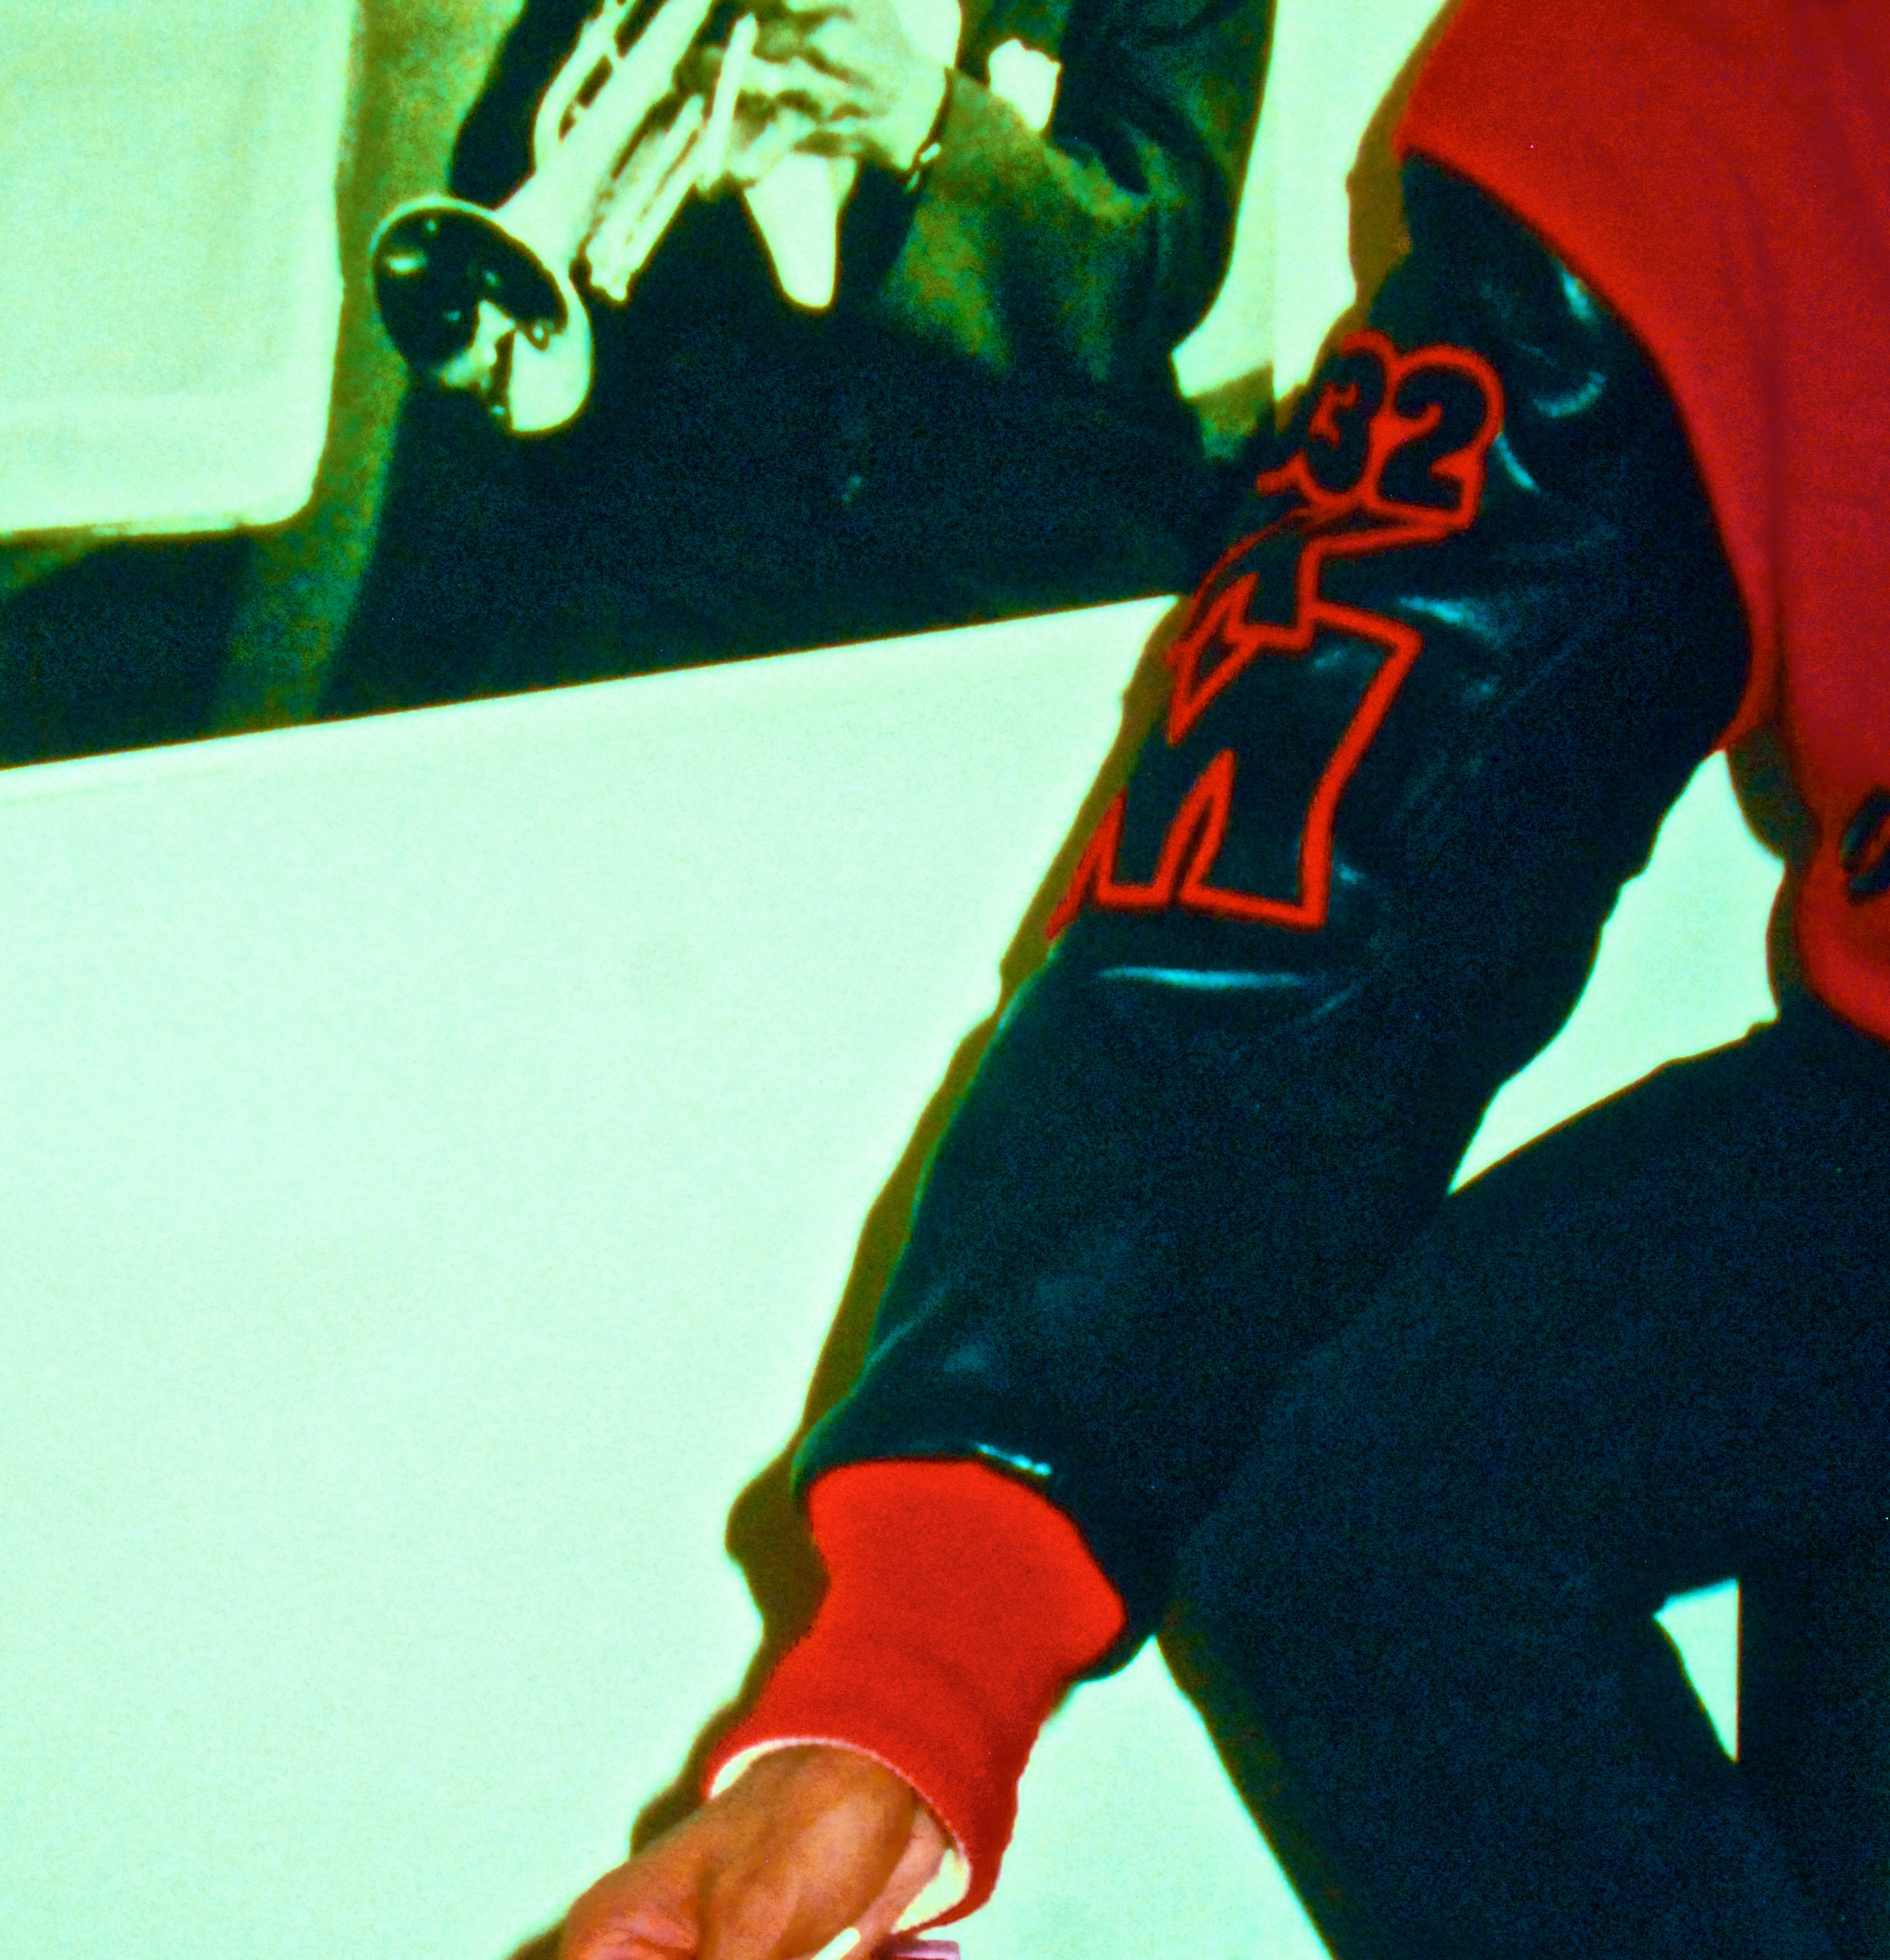 AMFM_MichaelJ cropped